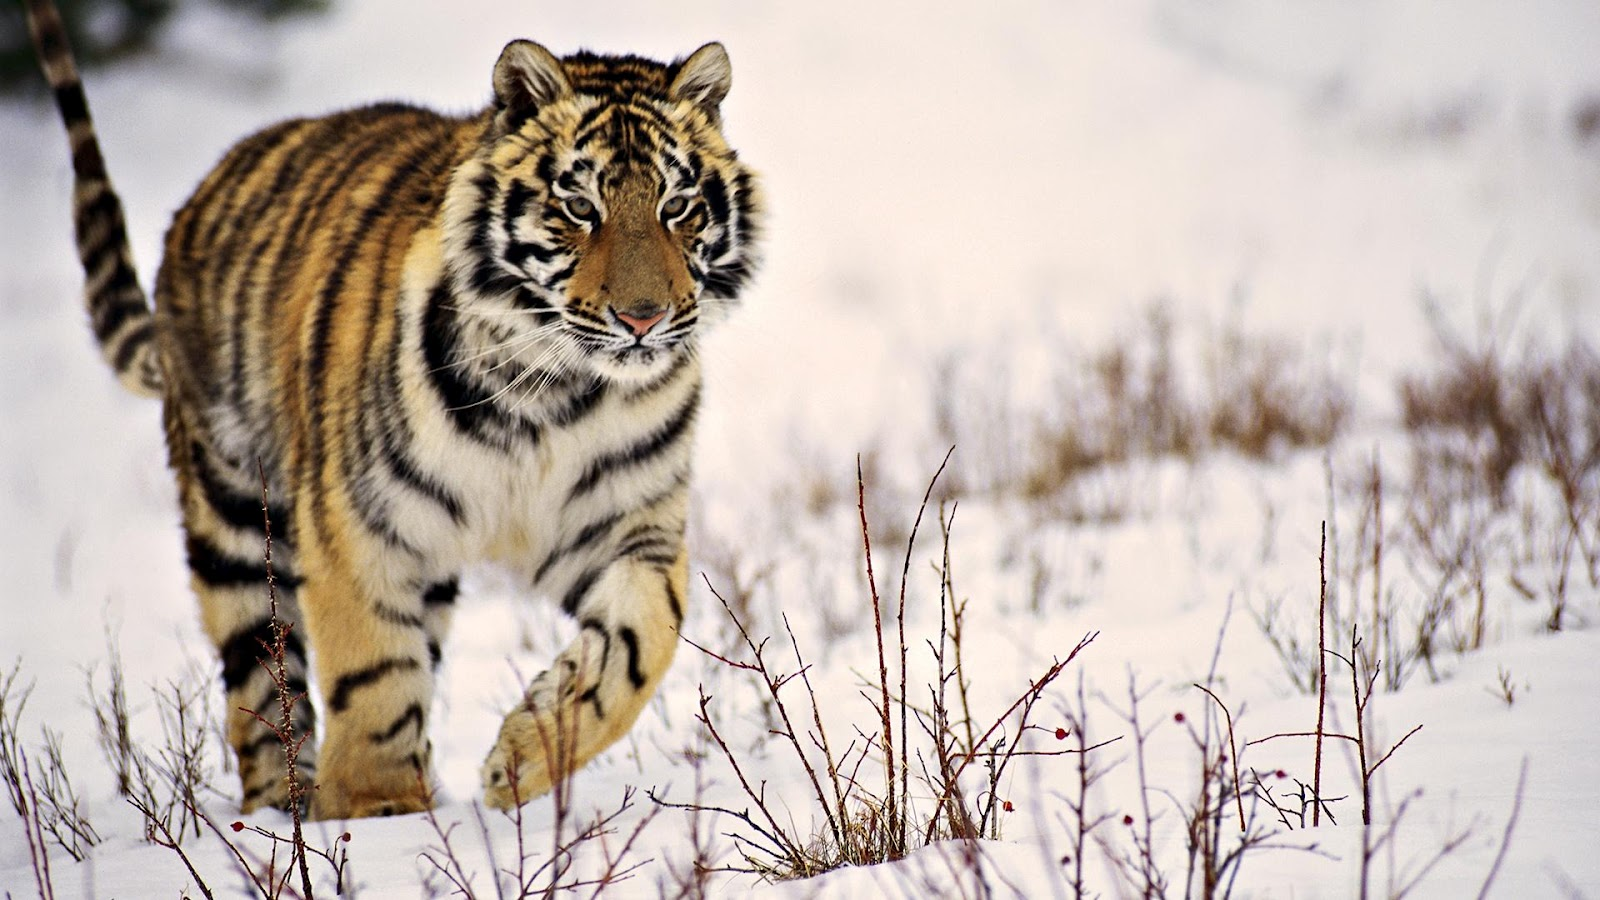 tiger wild snow - photo #1